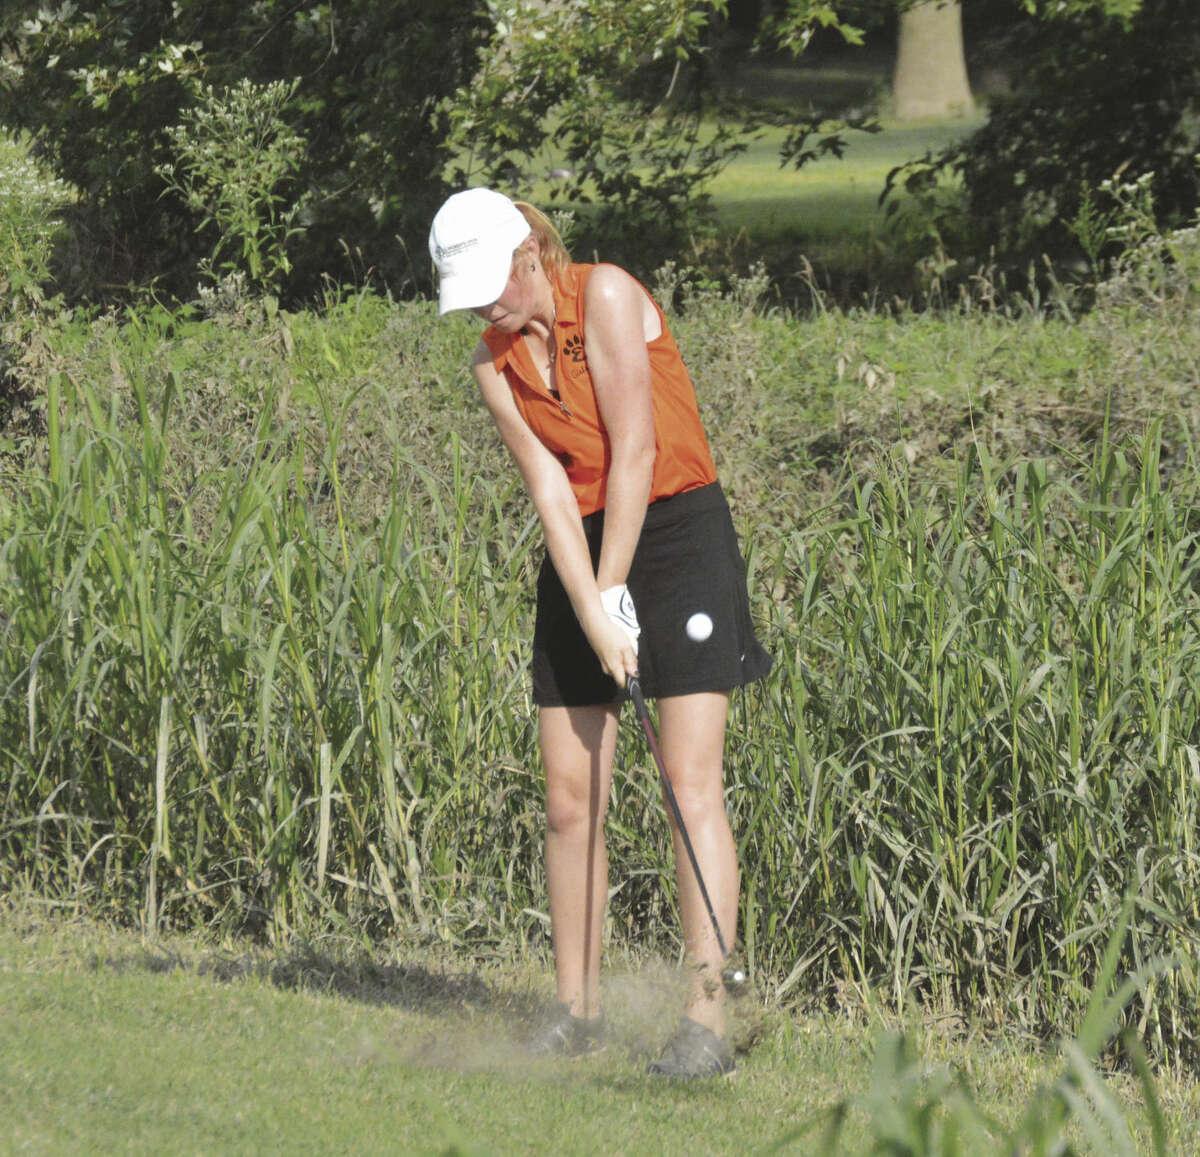 Edwardsville senior Kayla Weinacht hits an iron shot on the sixth hole of the east nine at Oak Brook Golf Club.